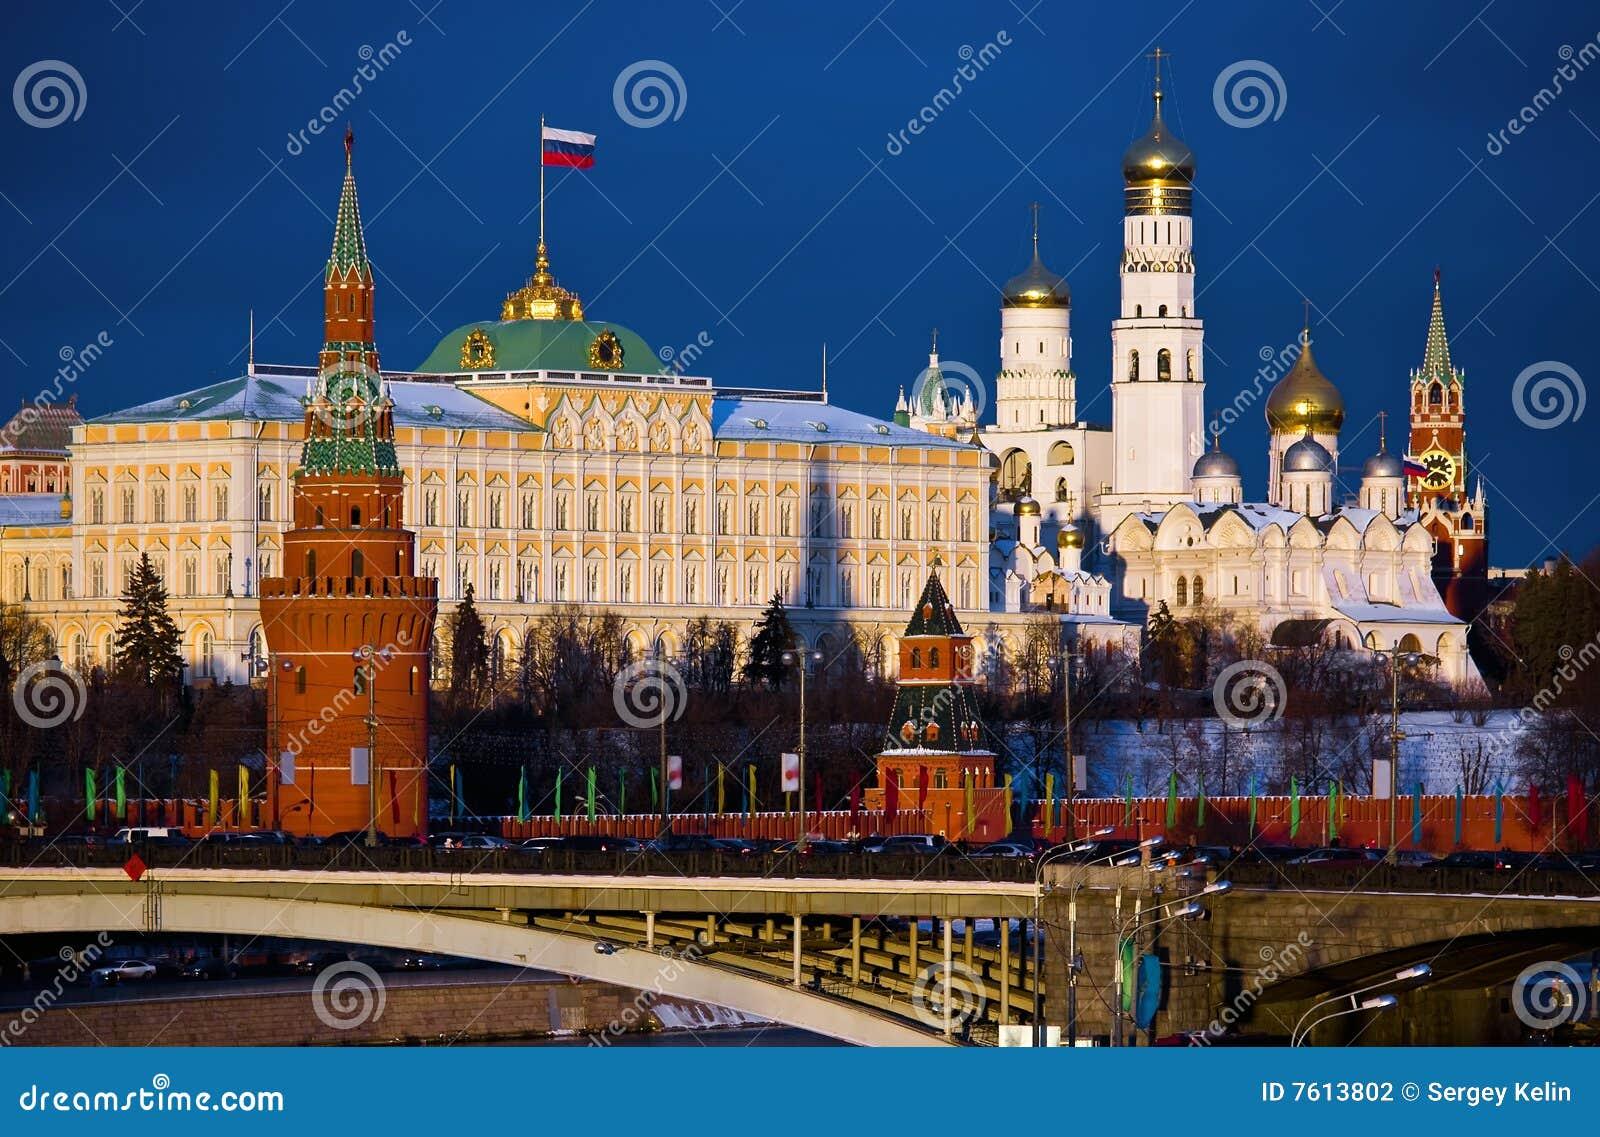 Moskau, Kremlin. Russland